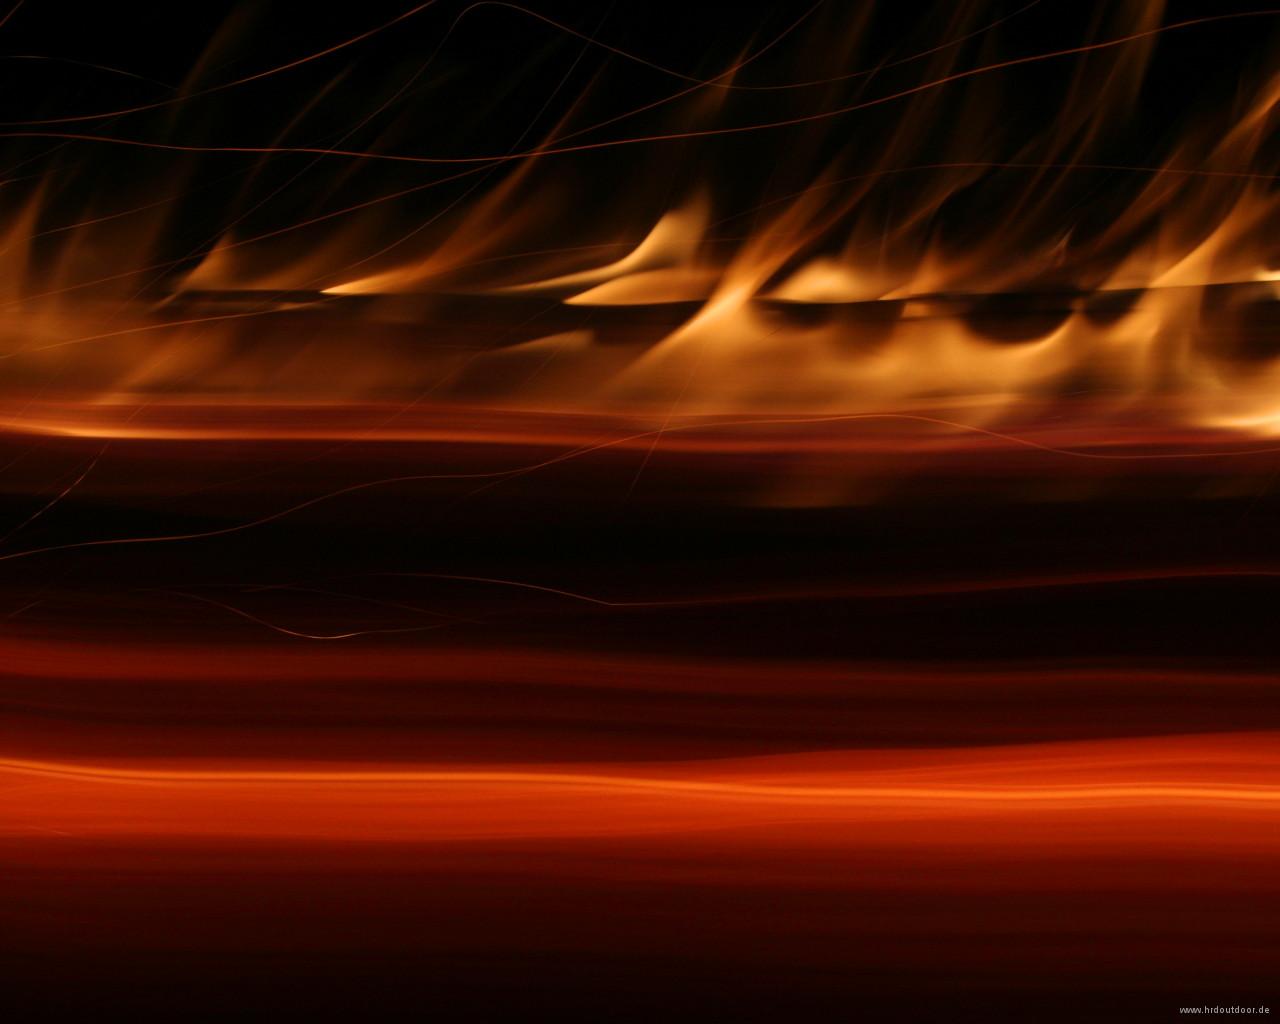 macs blog red fire - photo #5